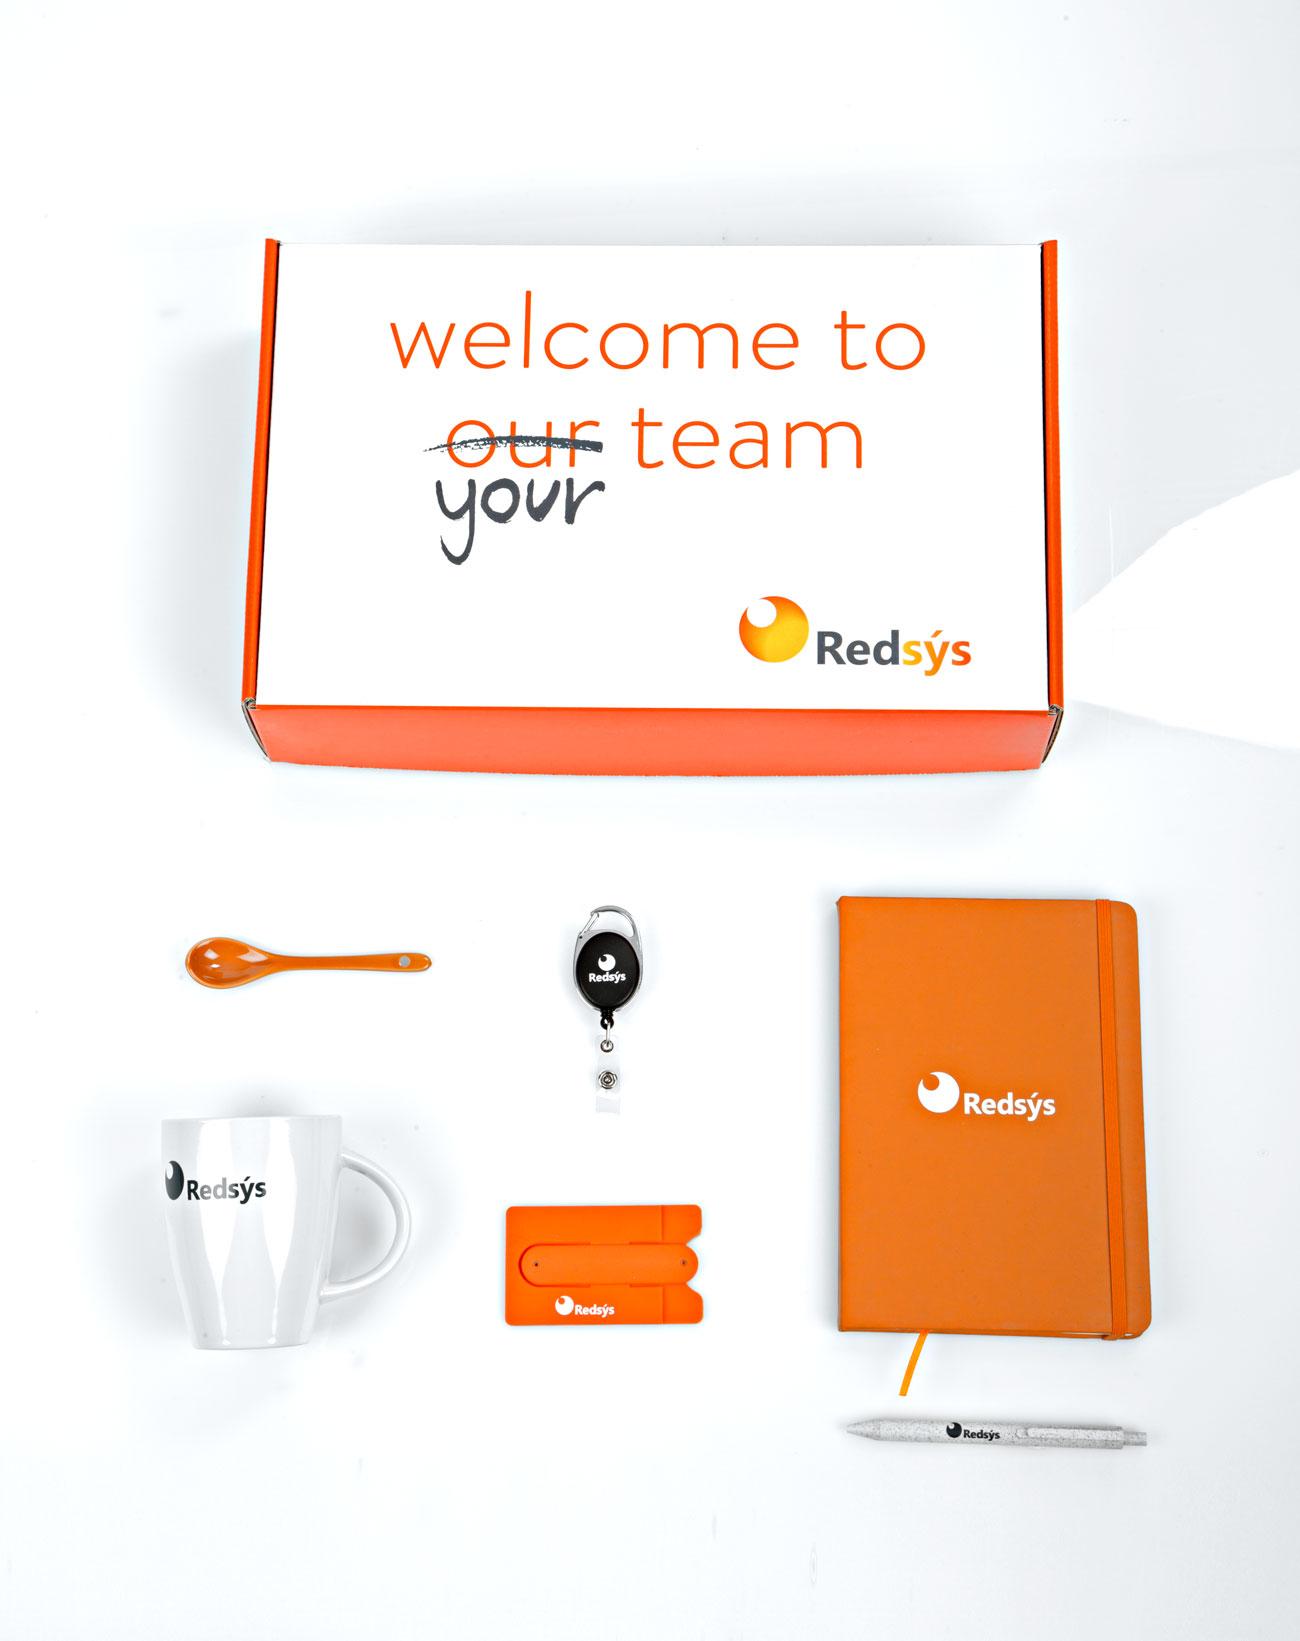 ugedafita redsys welcome pack 6